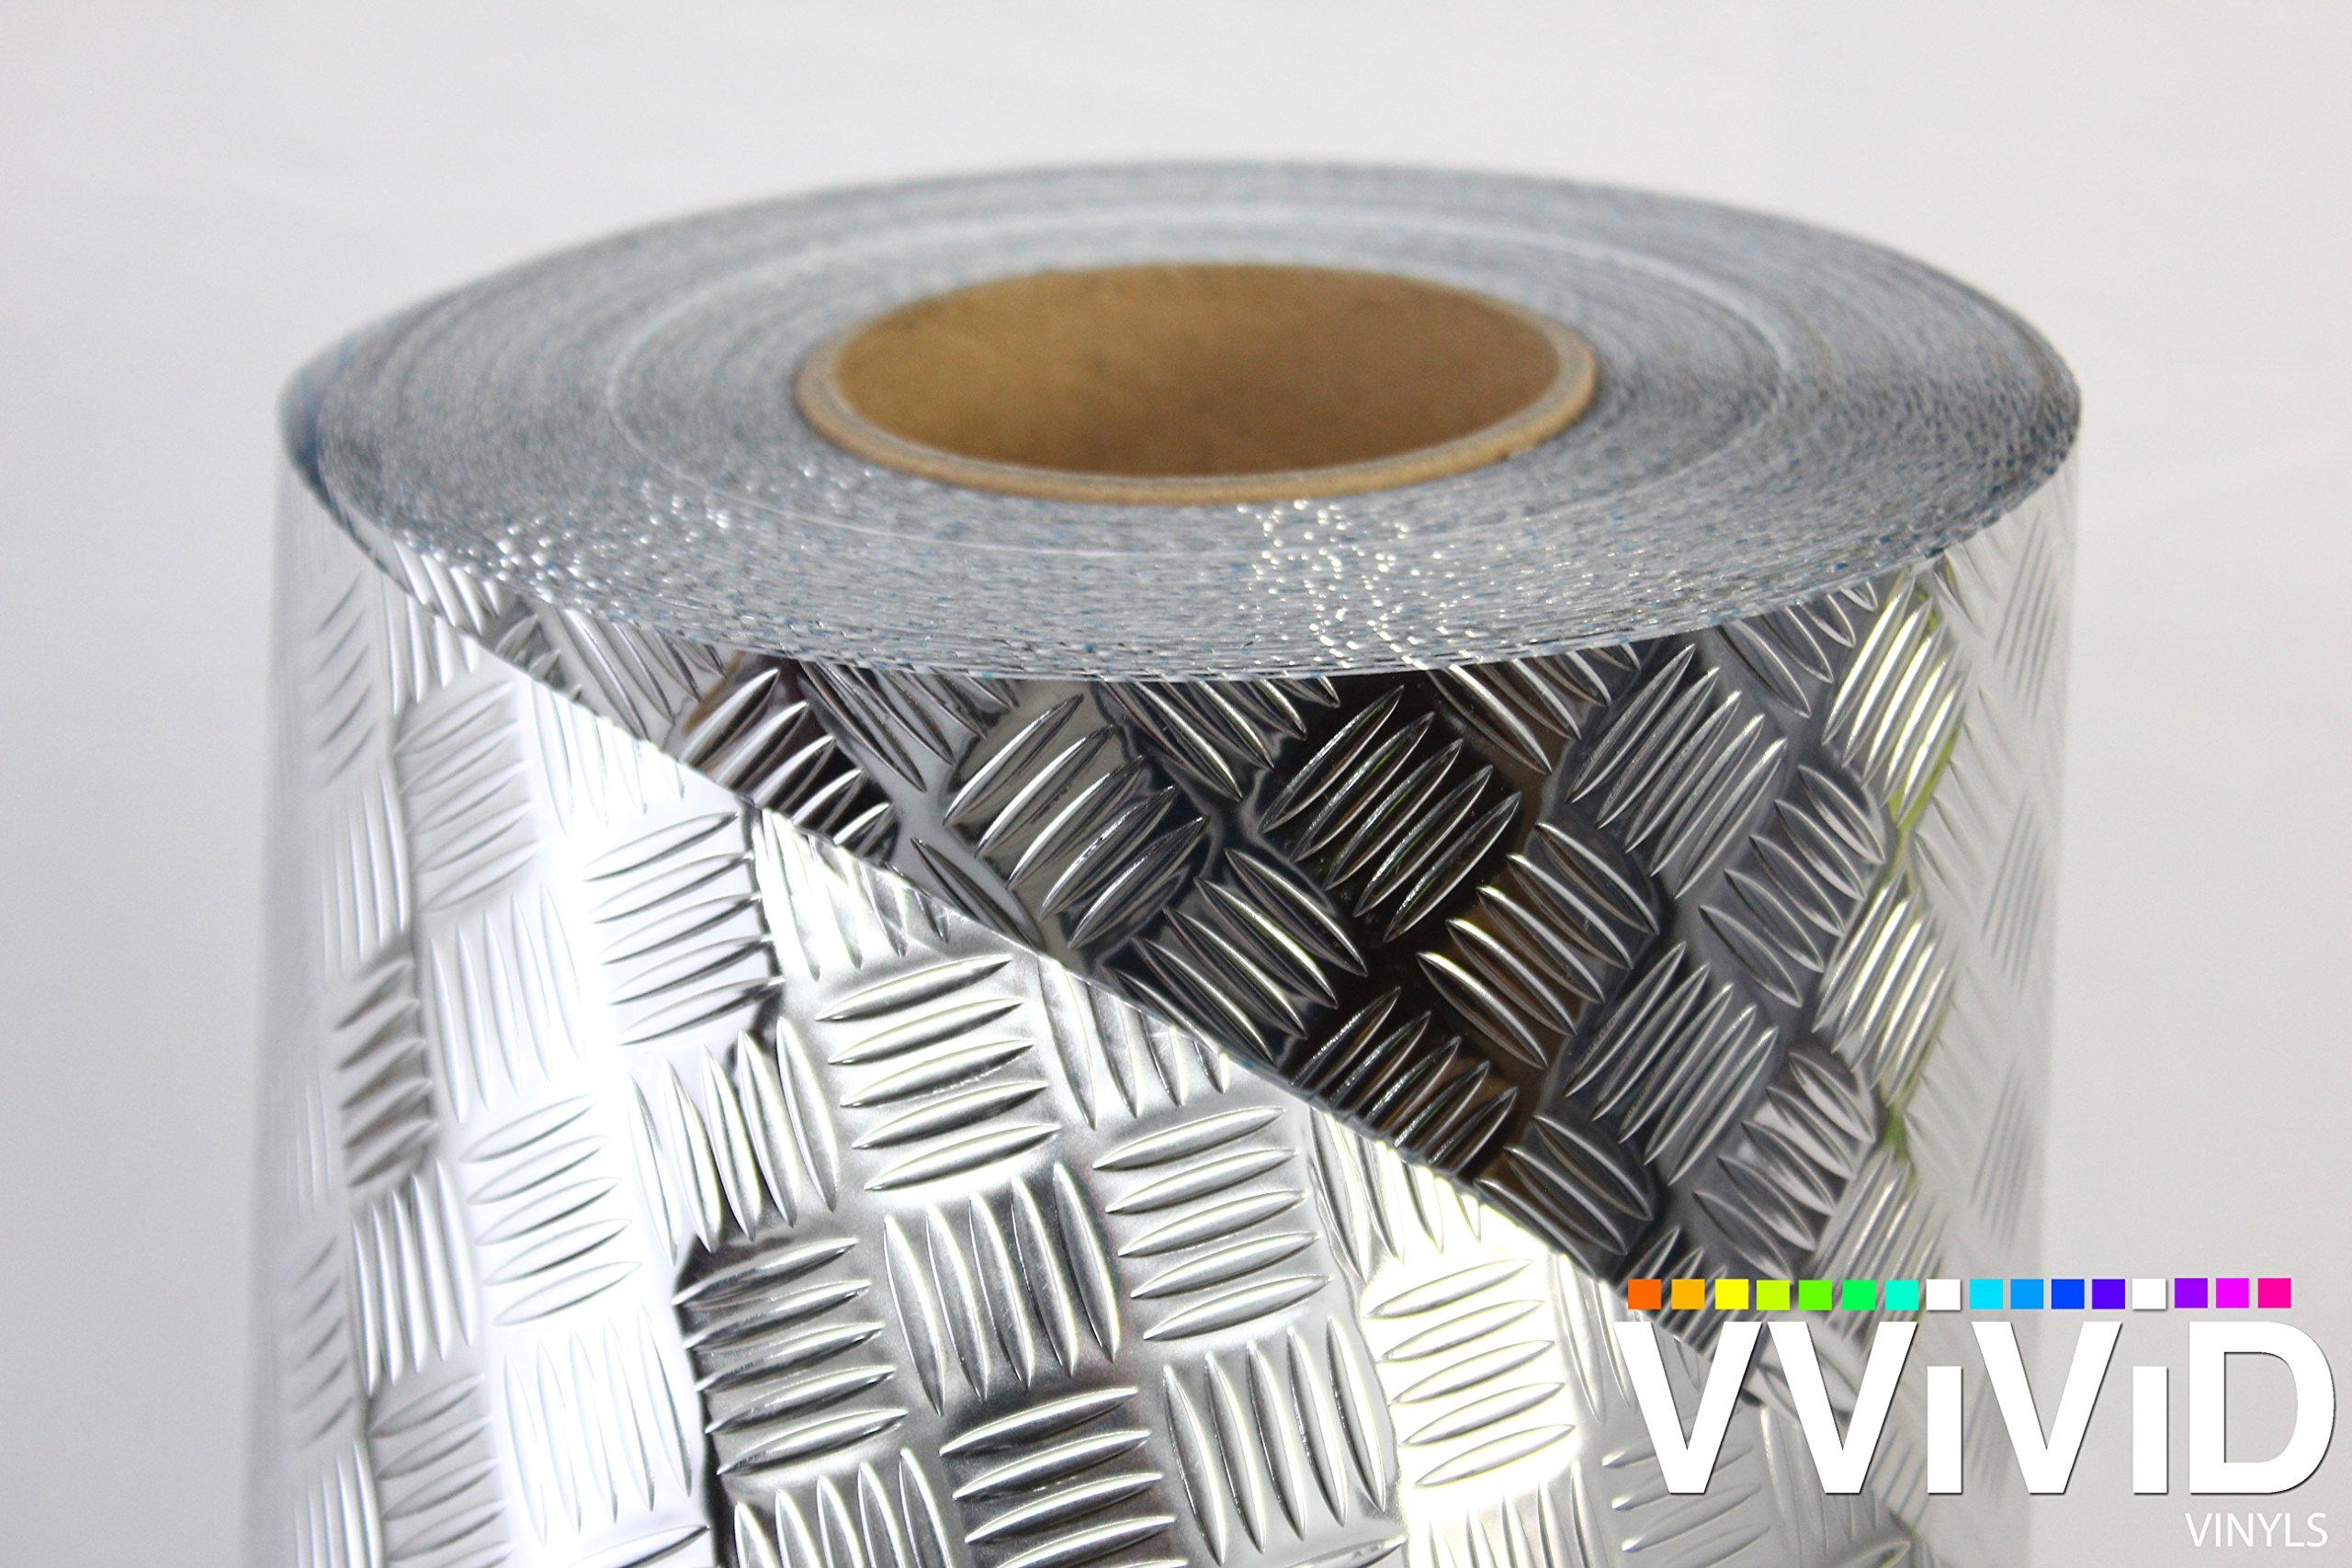 VViViD Metallic Industrial Diamond Plate Chrome Finish Self-Adhesive Vinyl Sheet Roll for Craft & Hobby Application (50ft x 17.8'')